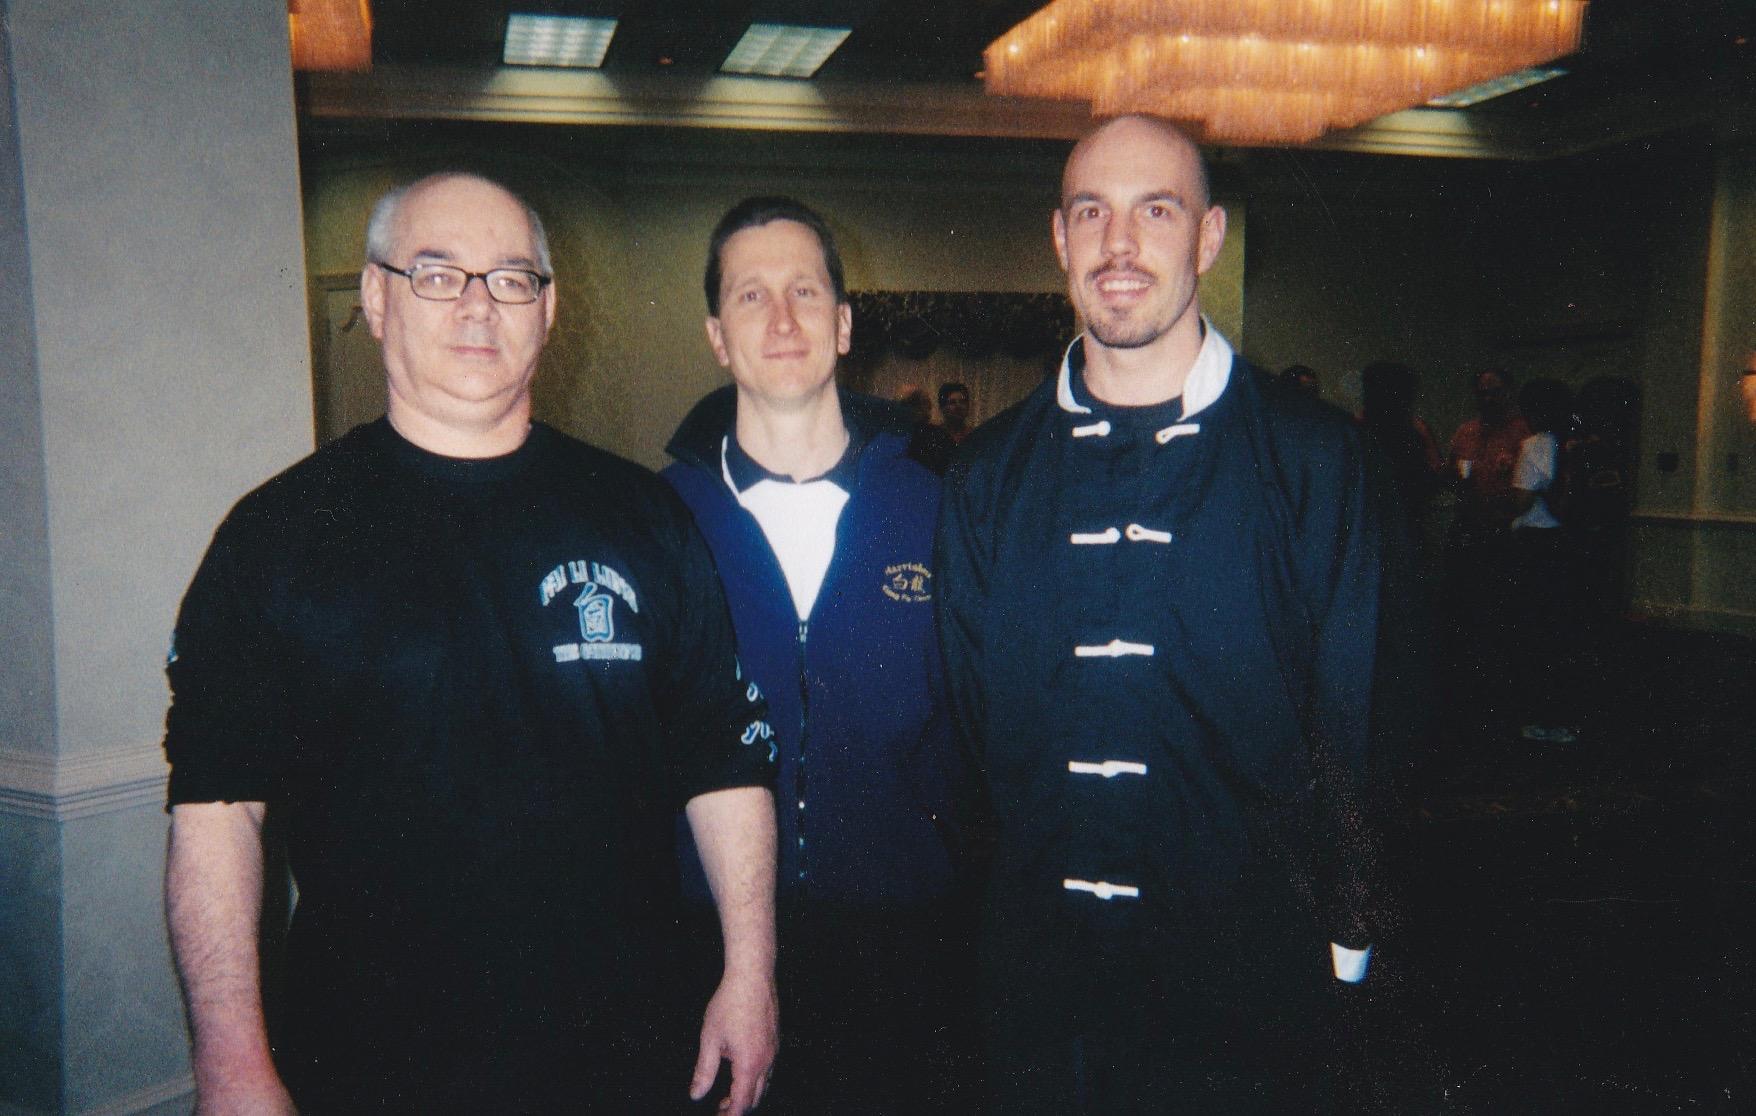 John WENInGER ( pai, li-lung ), Michael j rothermel ( pai, pono-li ),  SIFU JONATHON POLLOCK